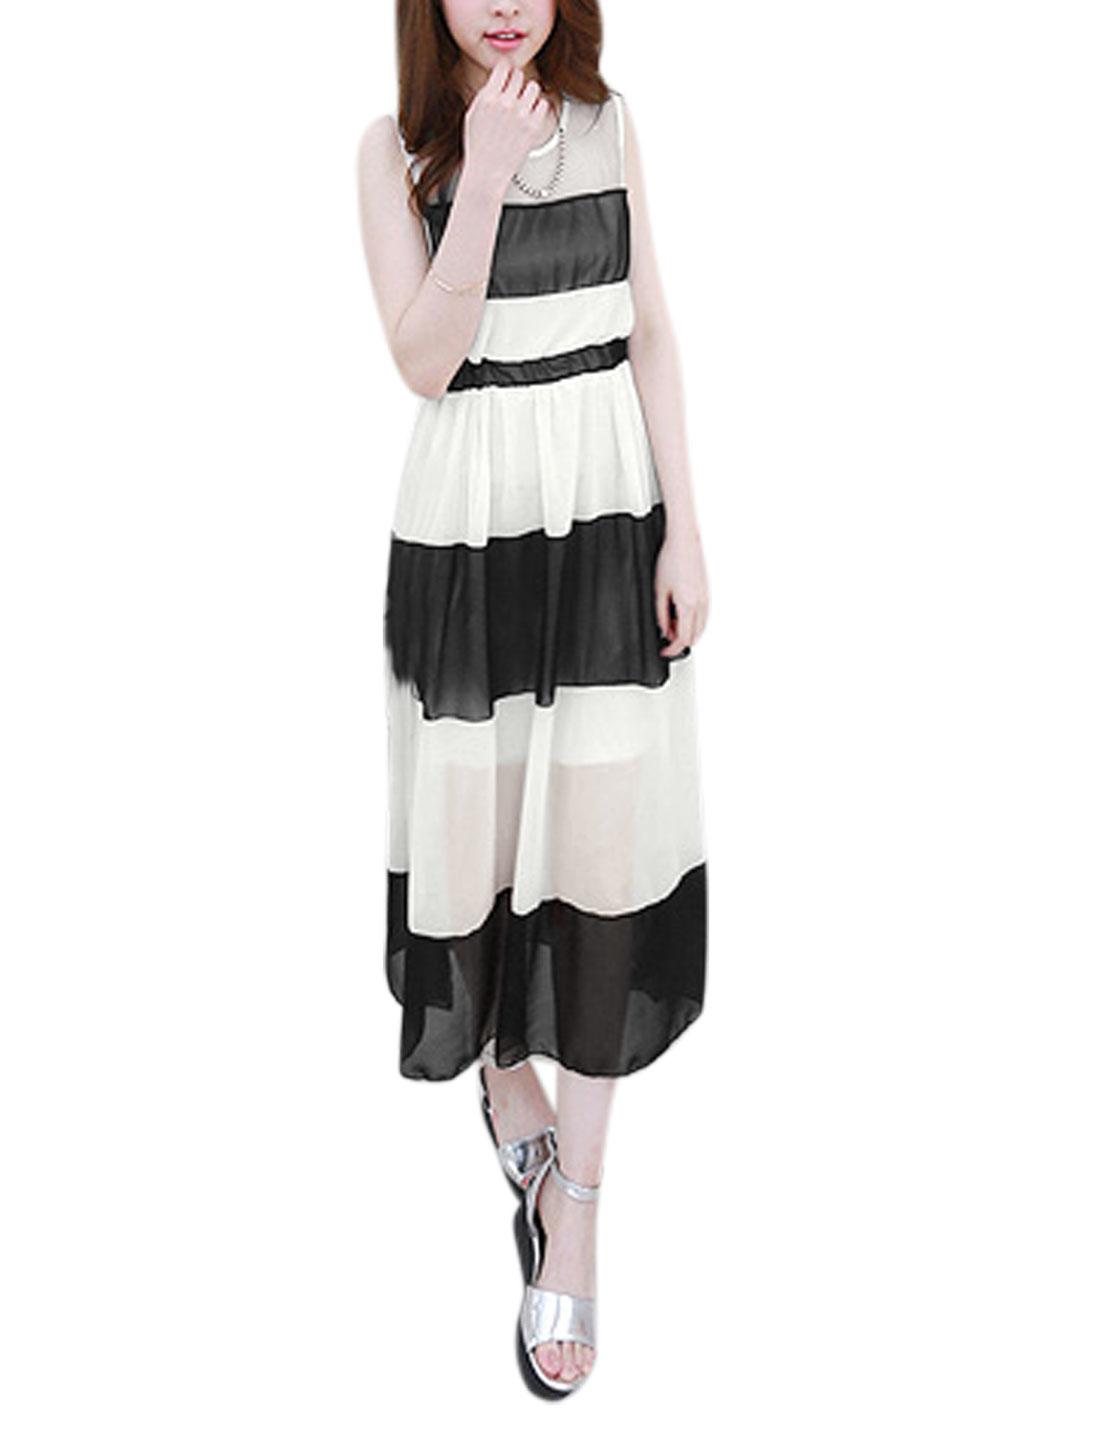 Women Round Neck Sleeveless Color Blocked Casual Dress Black White S